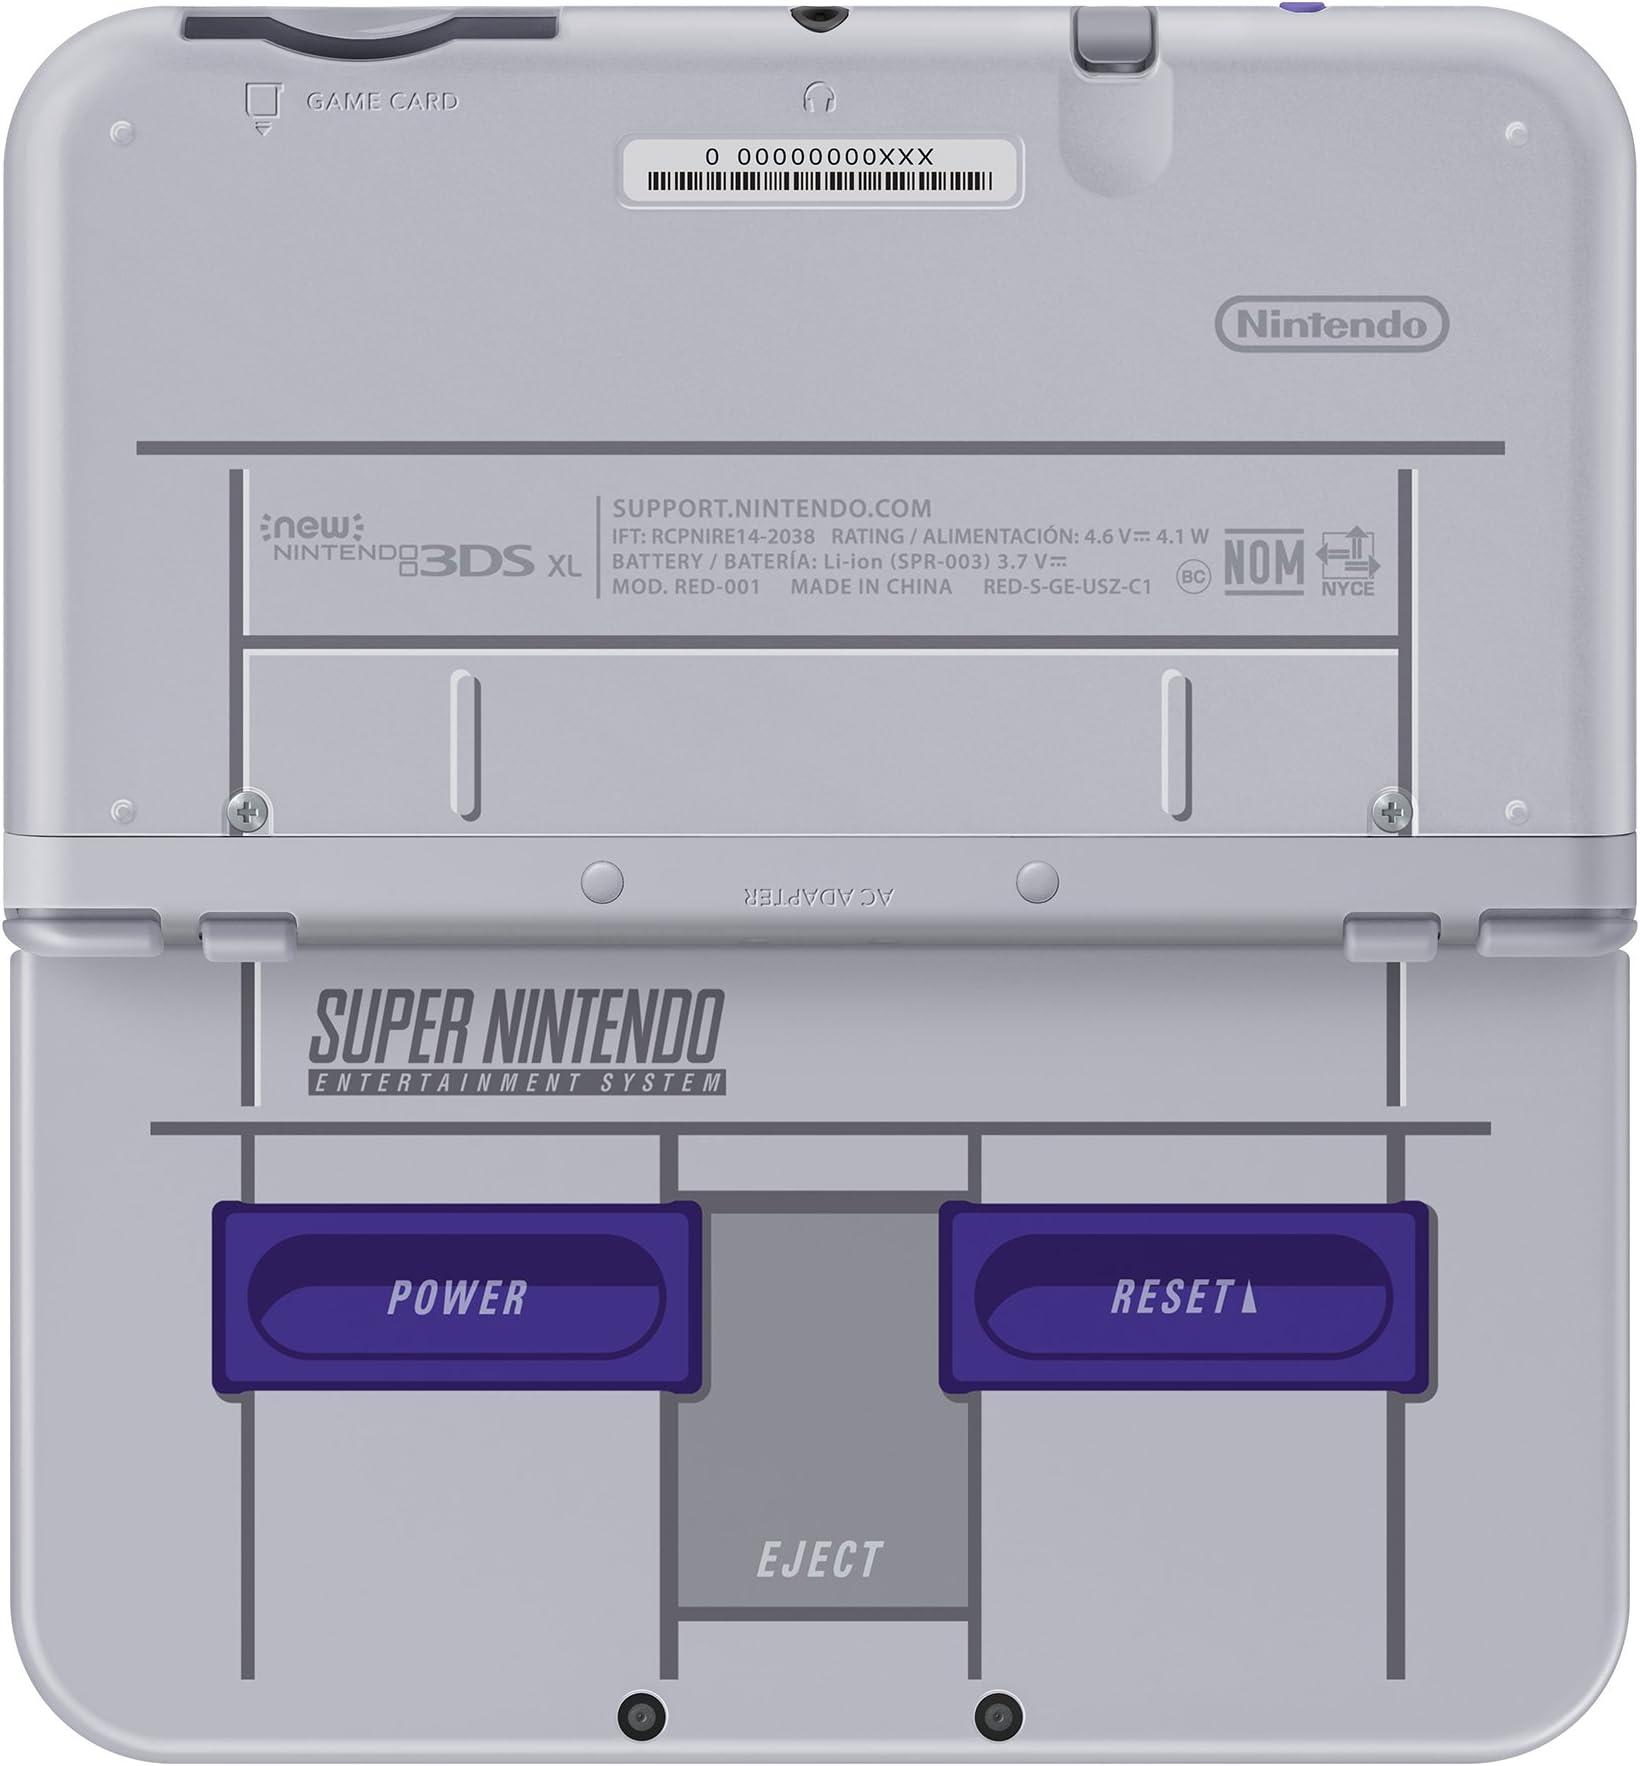 New Nintendo 3DS XL Super nintendo US 715cWotlJJL._AC_